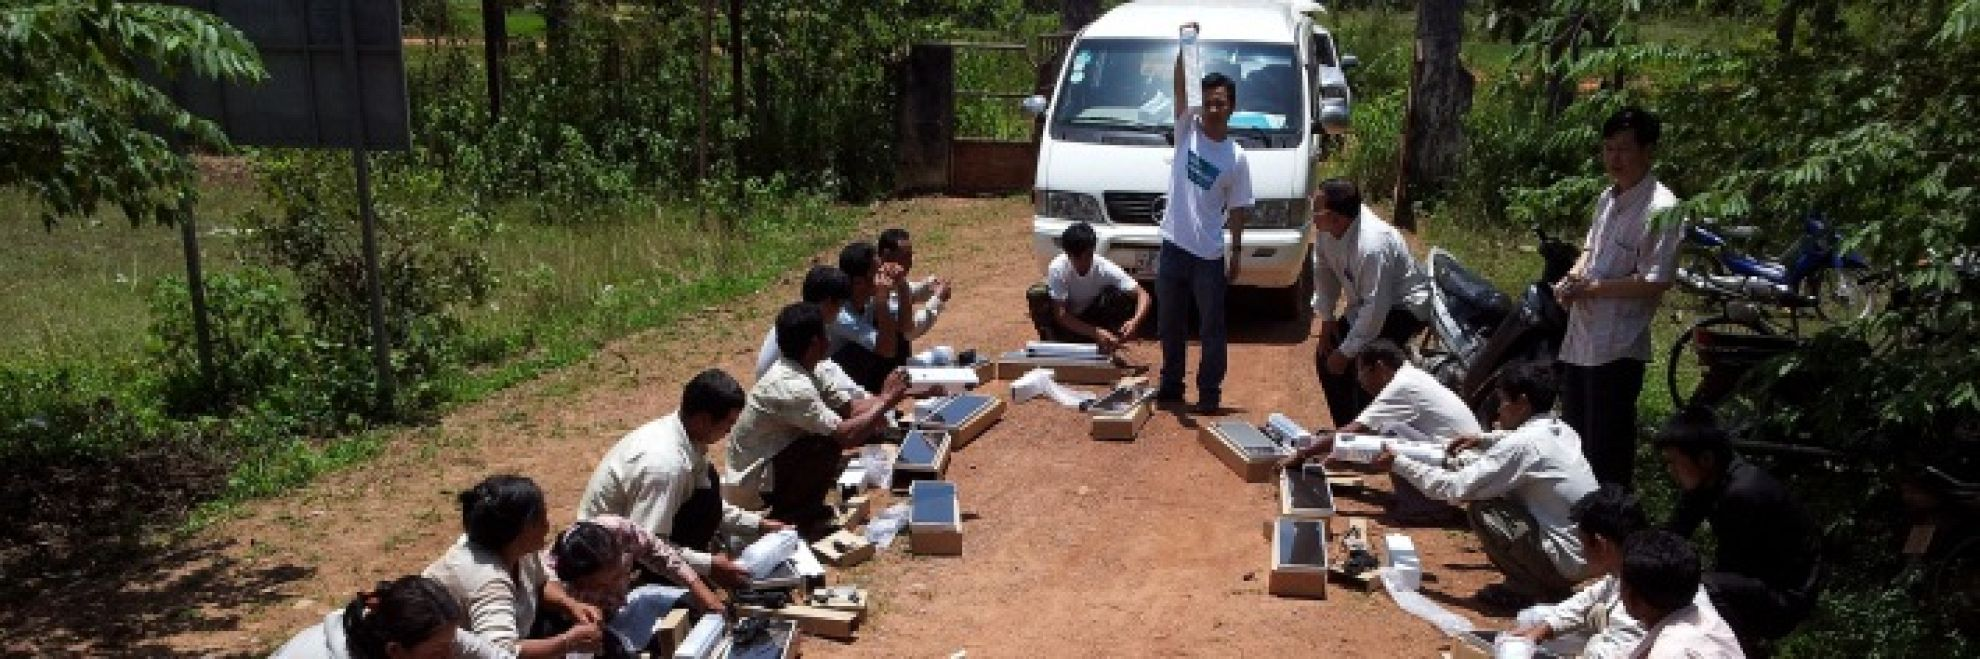 Latest News Innovation moving towards malaria elimination in cambodia